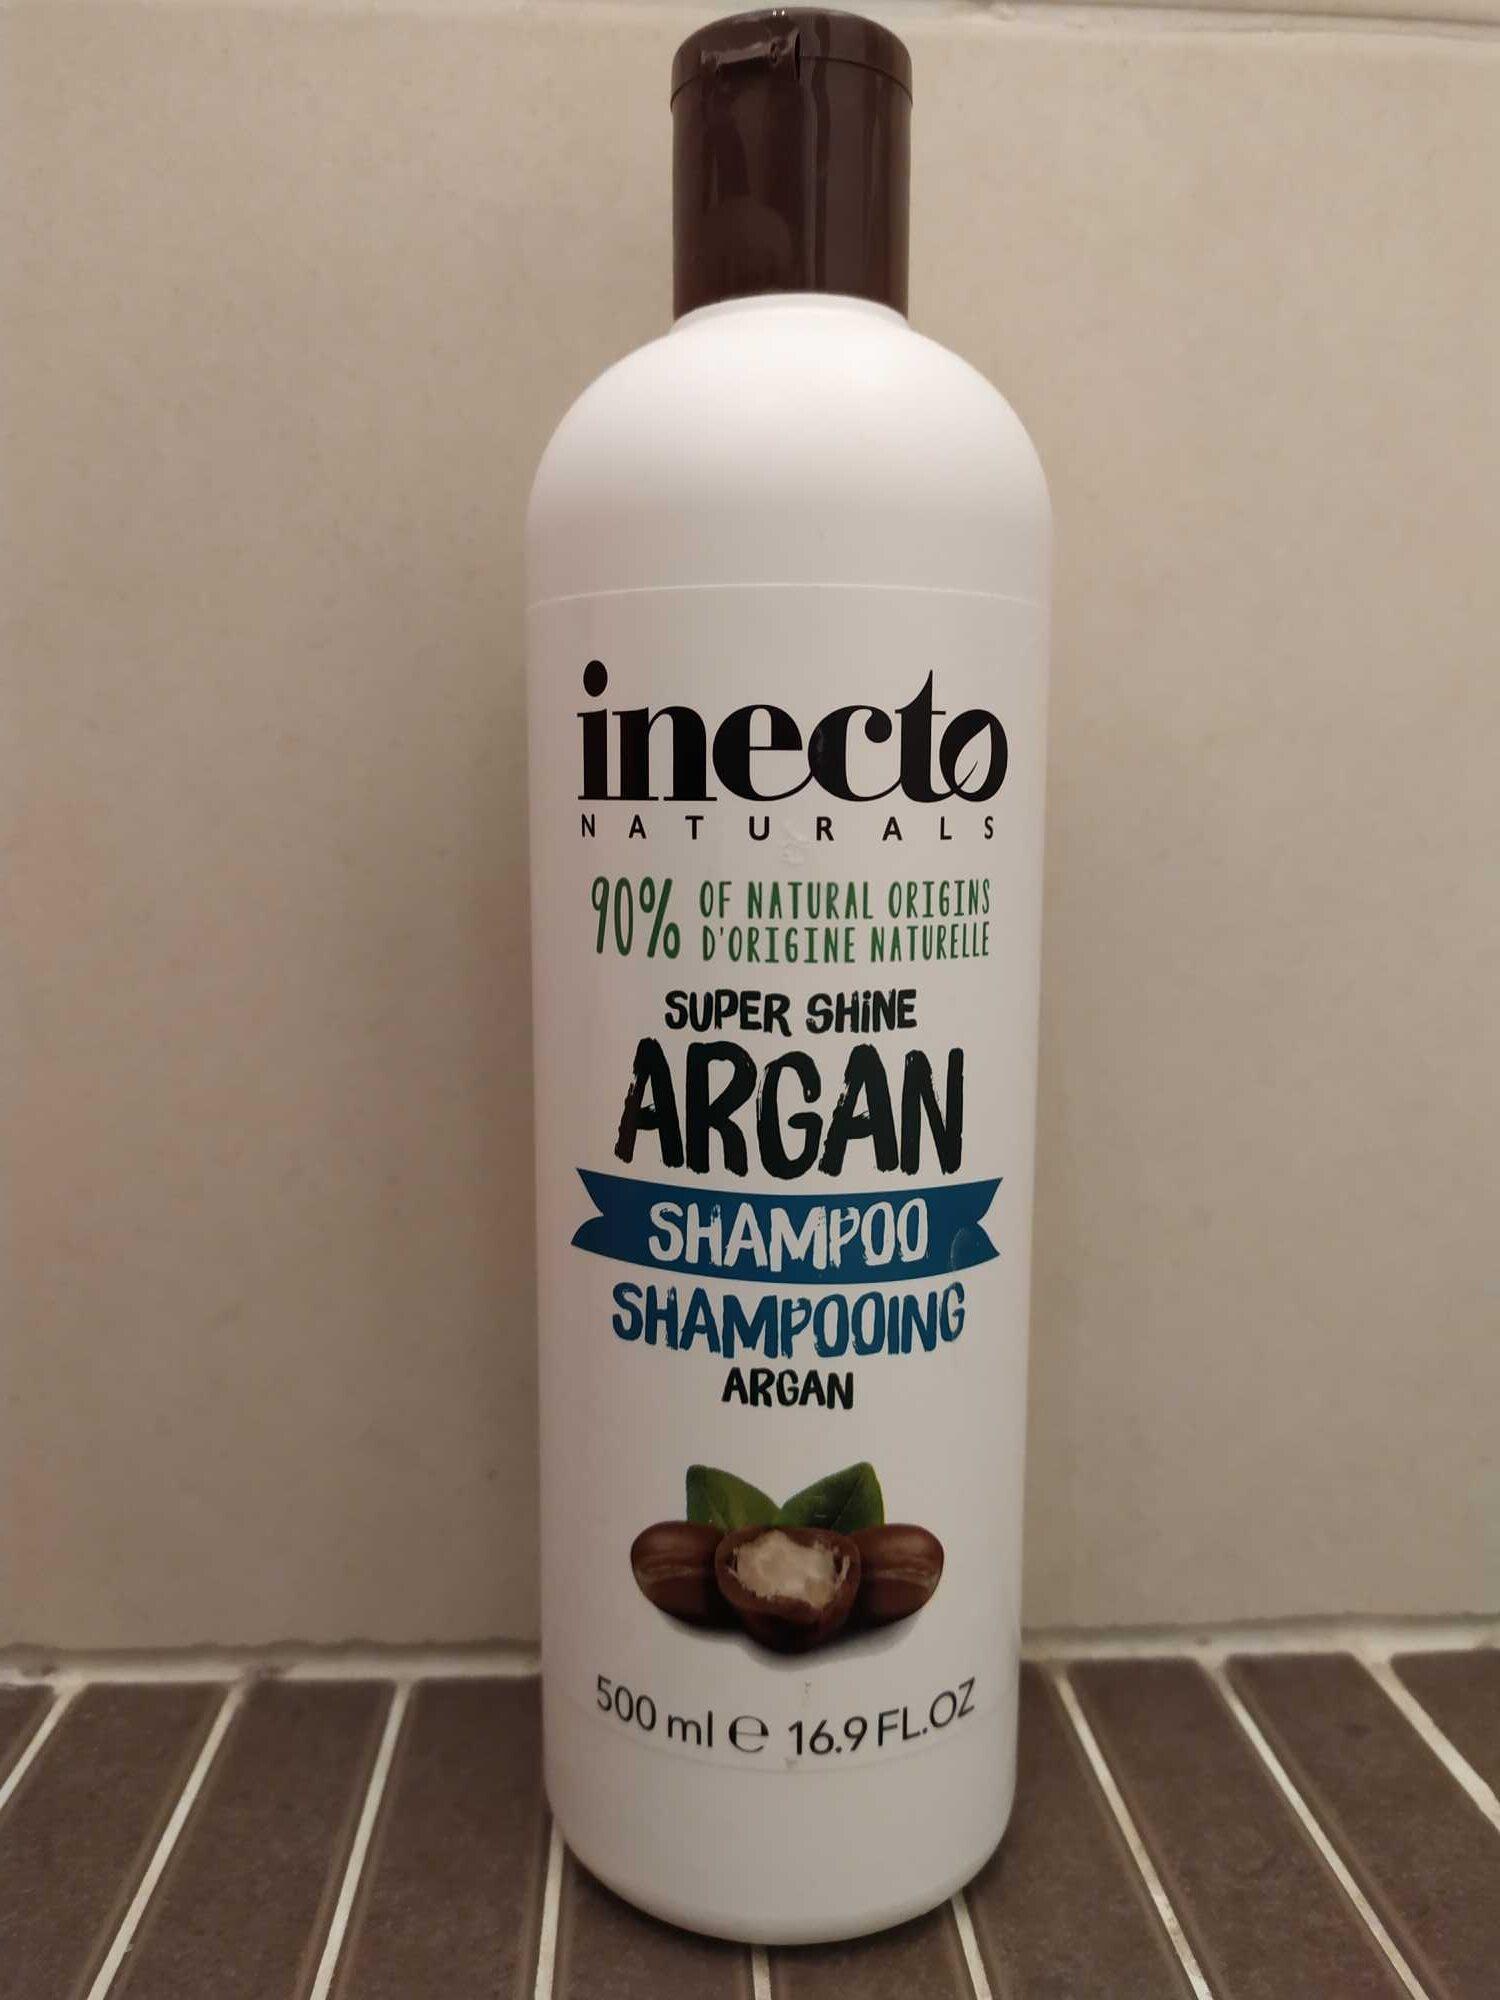 Shampoing ARGAN - Product